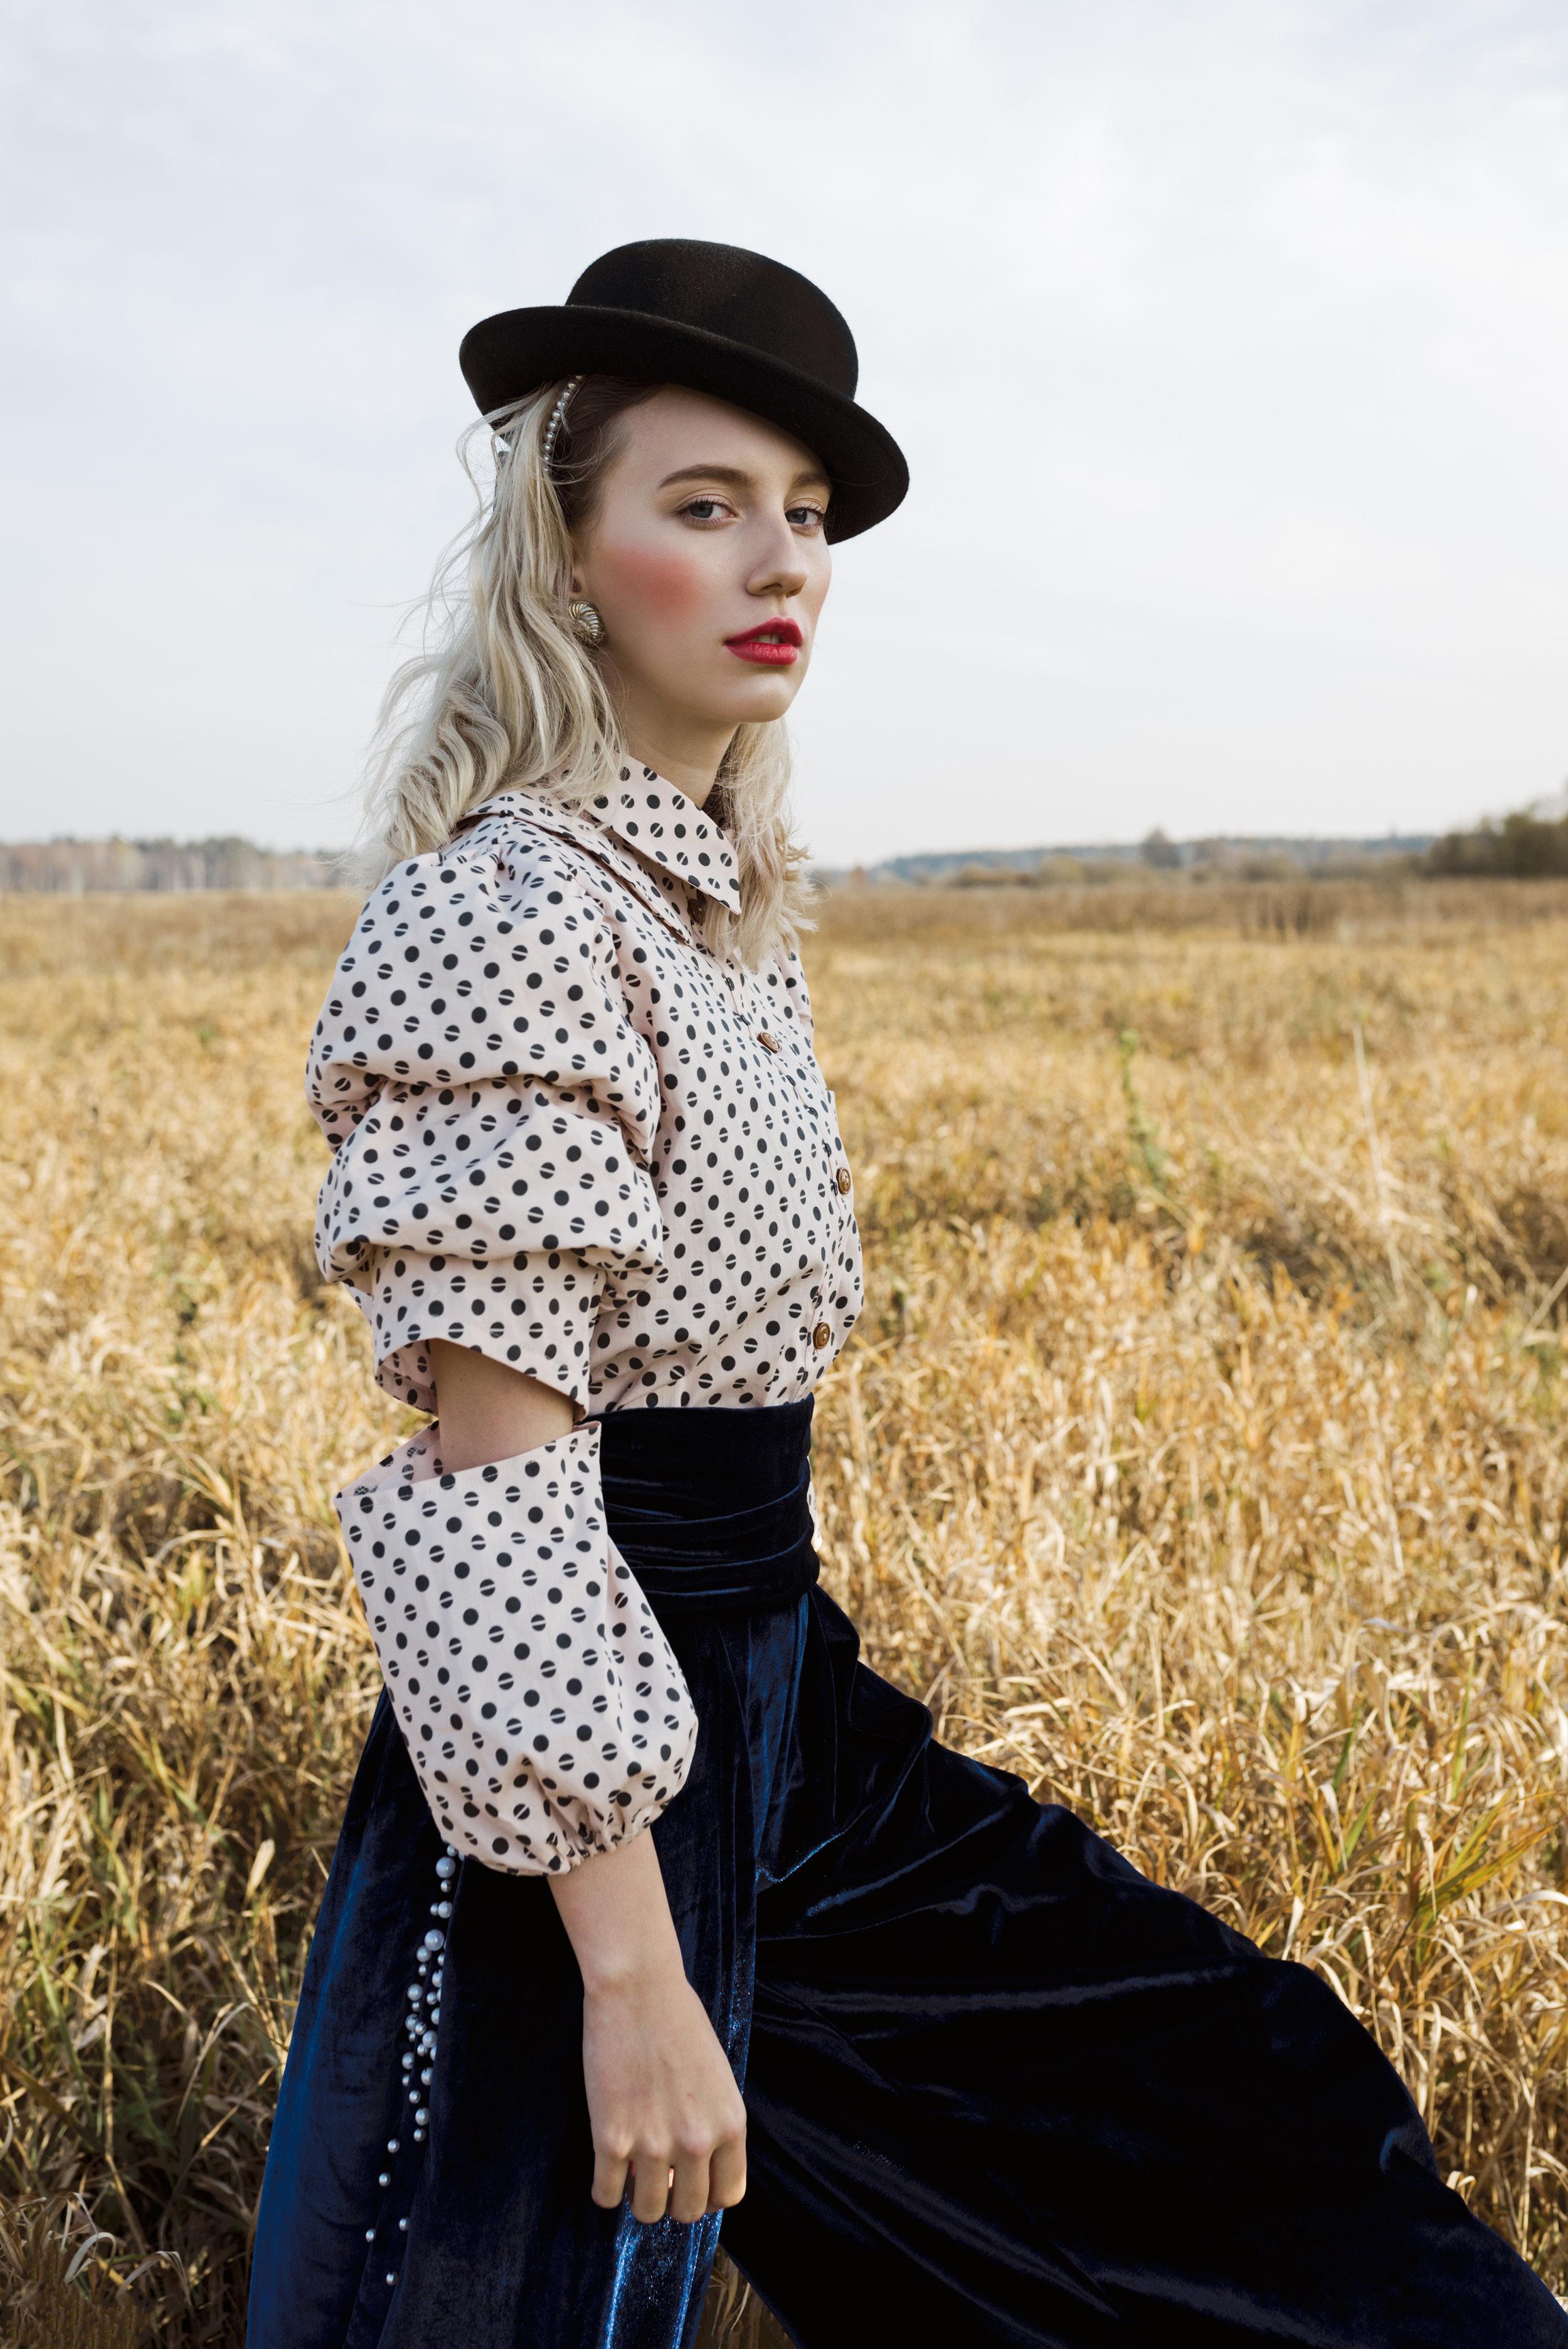 Pants - Okult Brand  Shirt- MoMi-Ko  Earrings - vintage  Hat - Zara